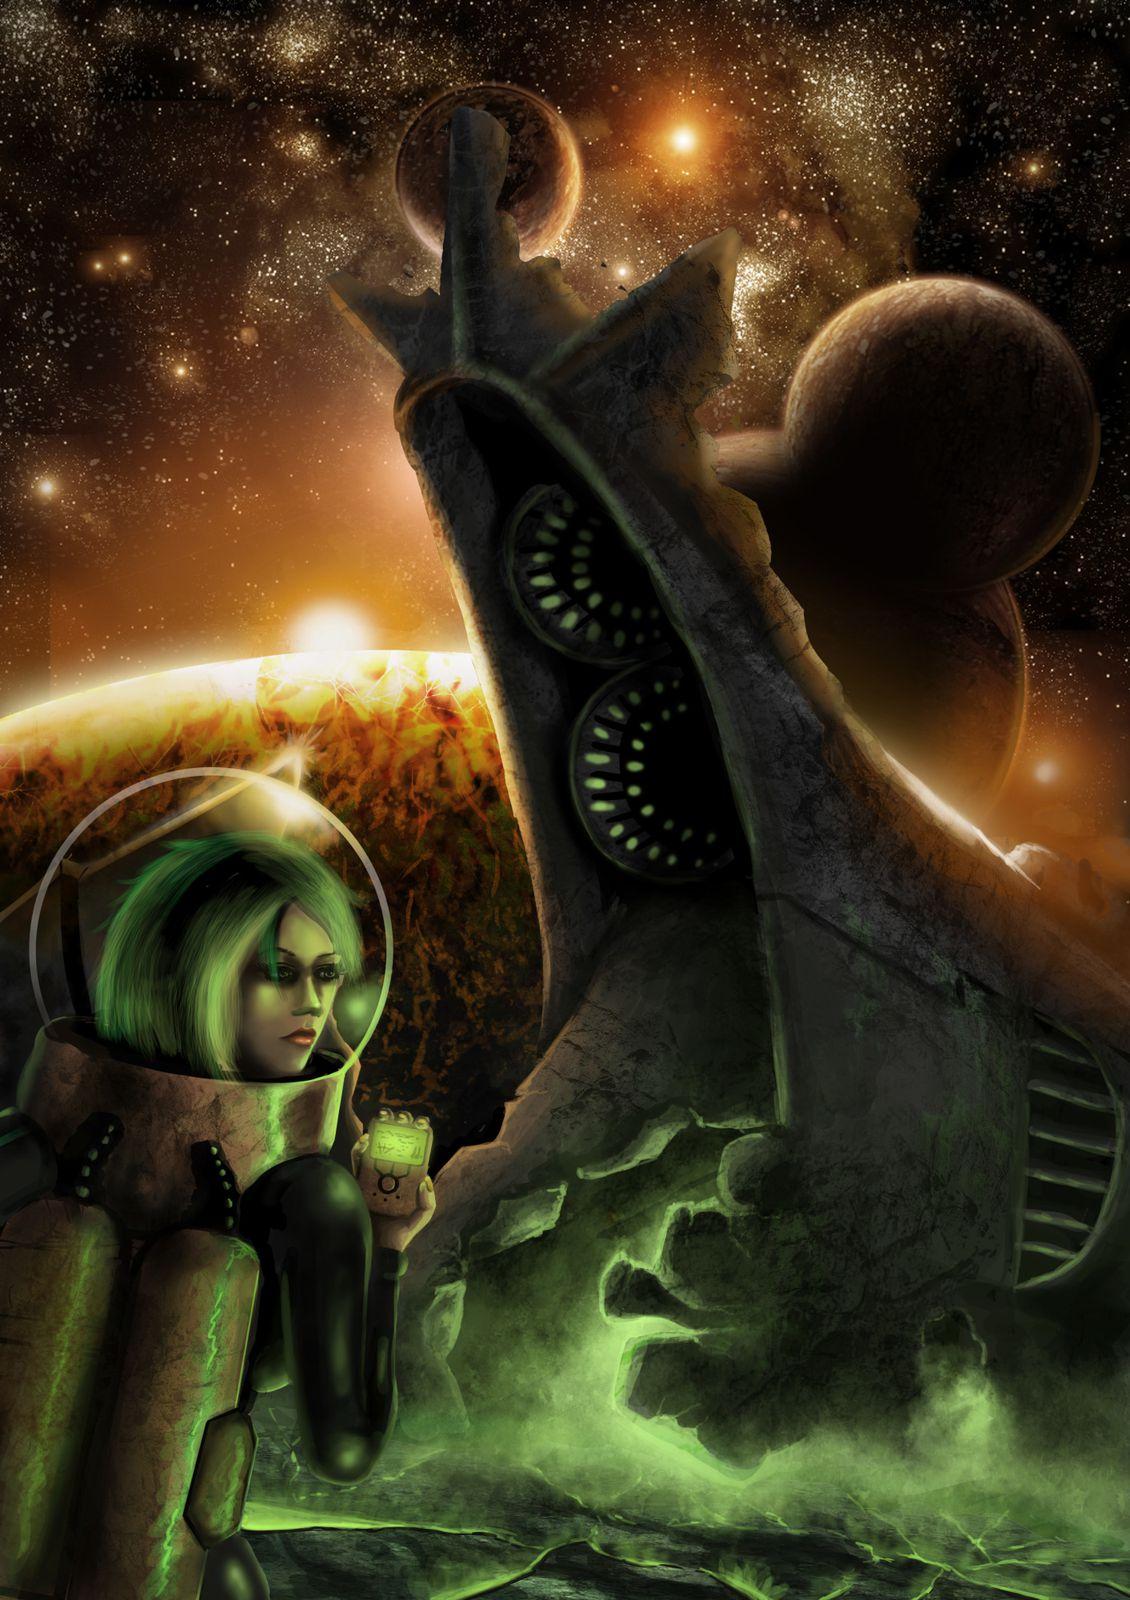 Personal Work: Space crash